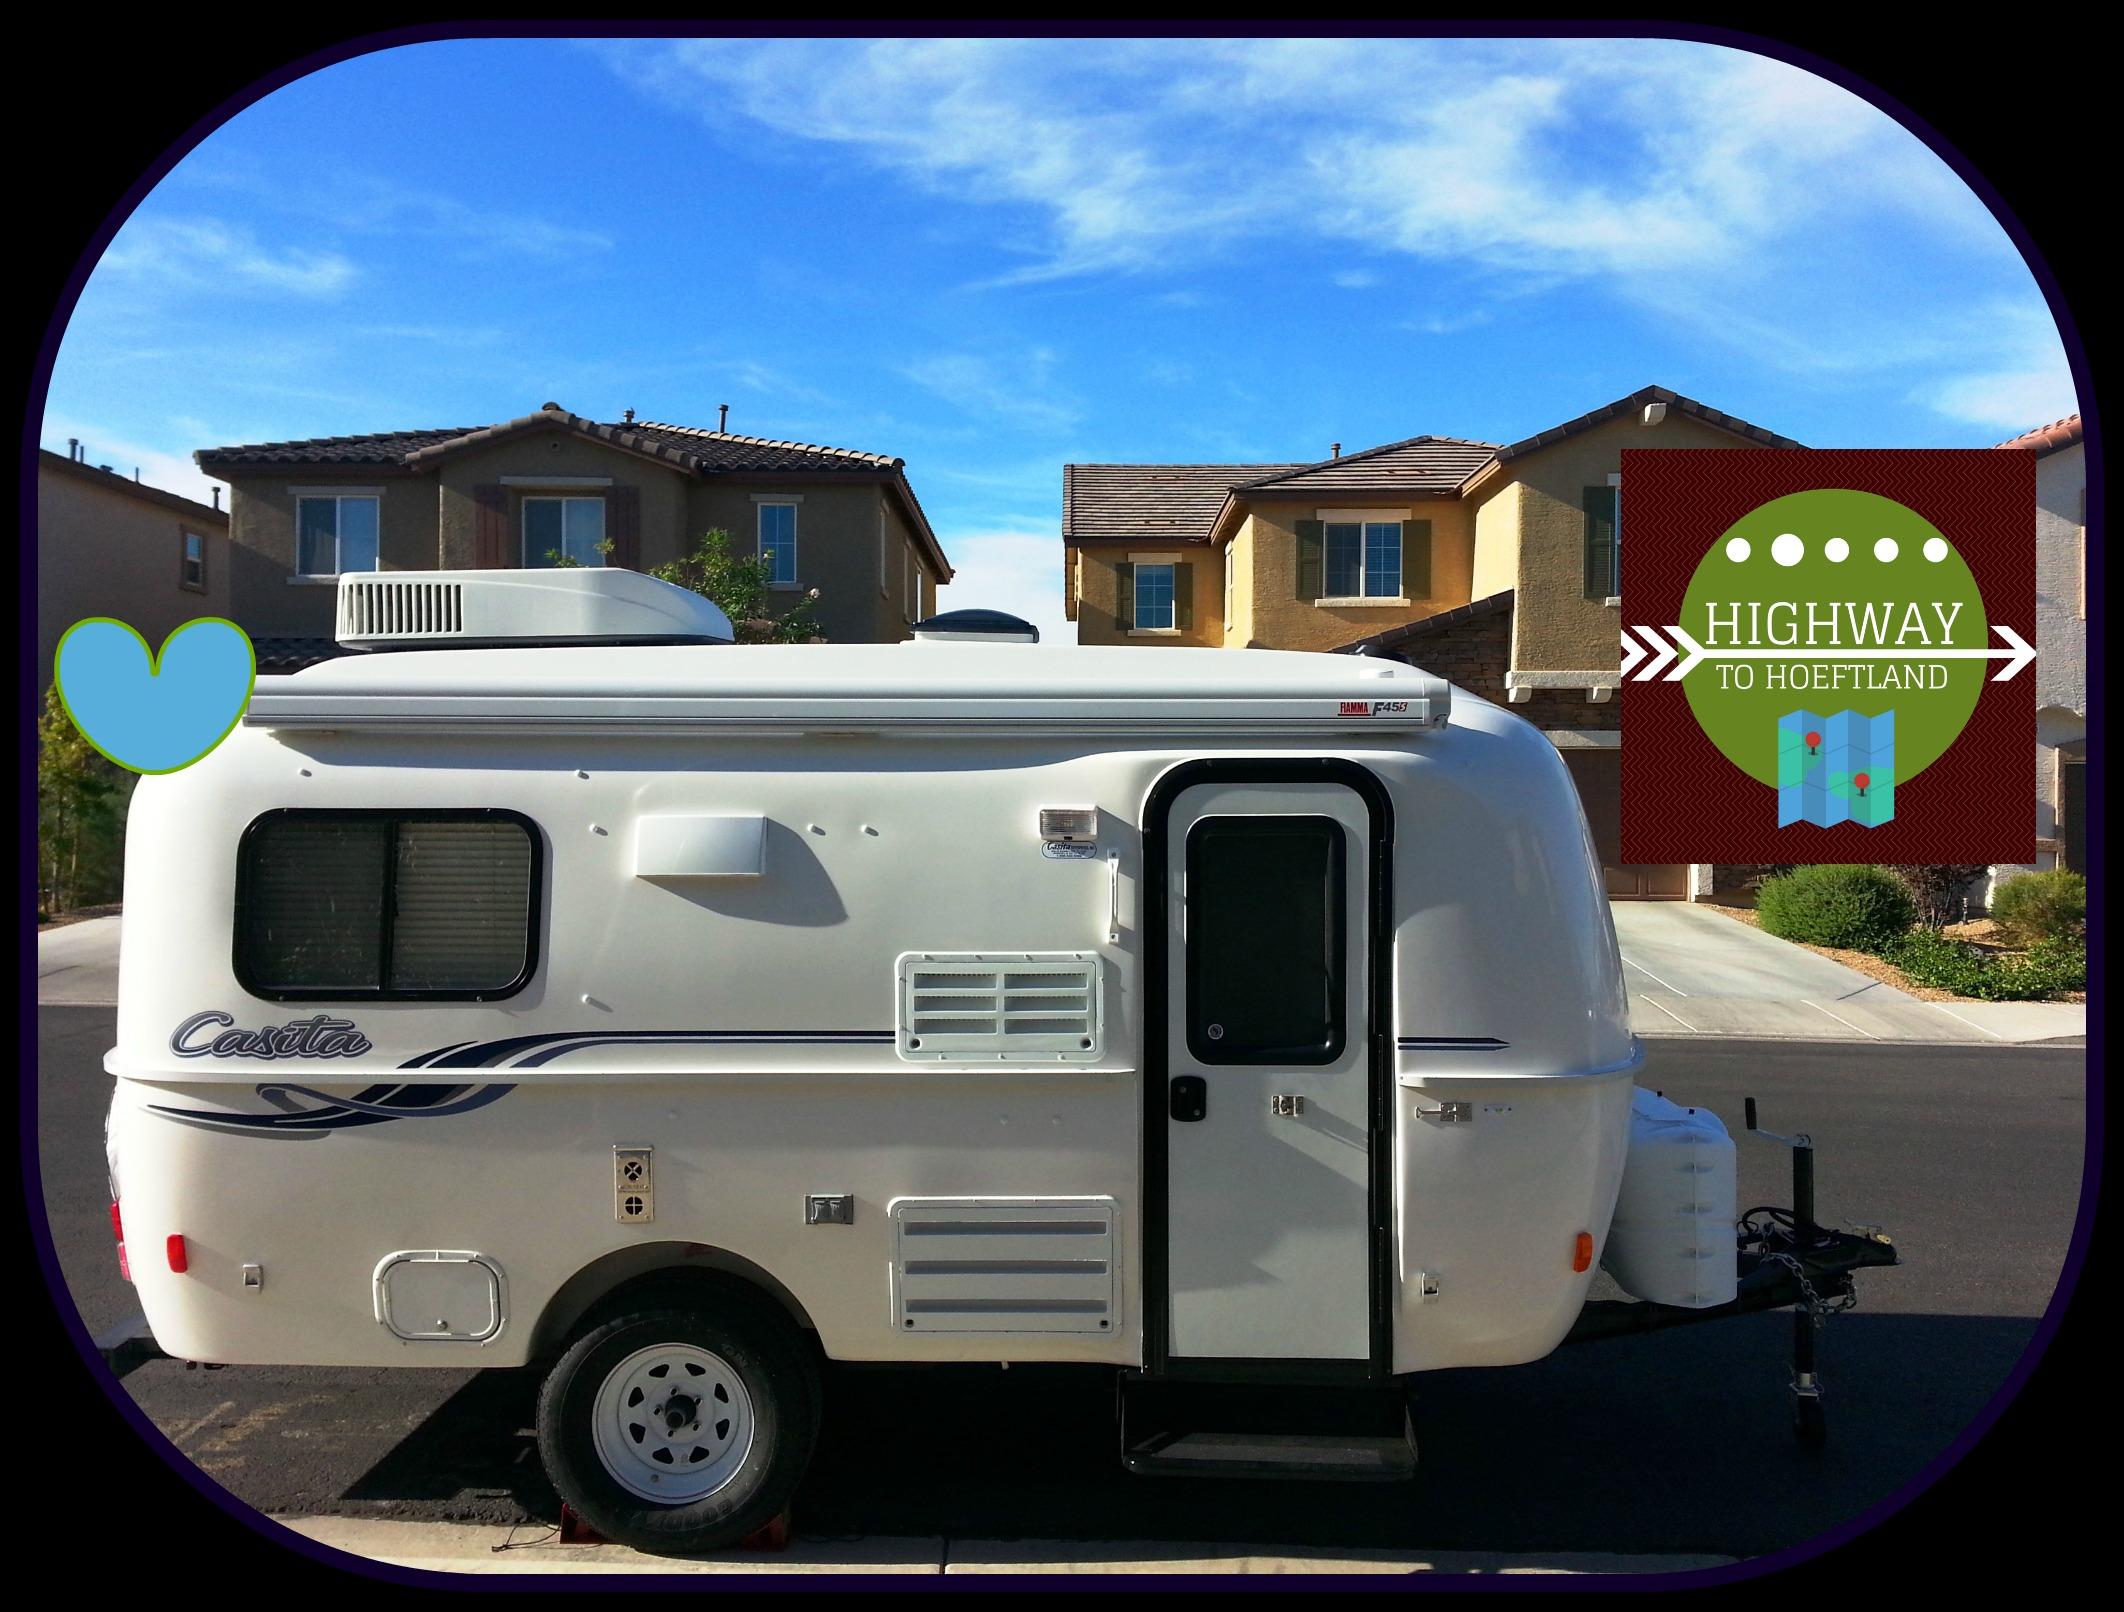 2015 Casita Travel Trailer Spirit Deluxe Model